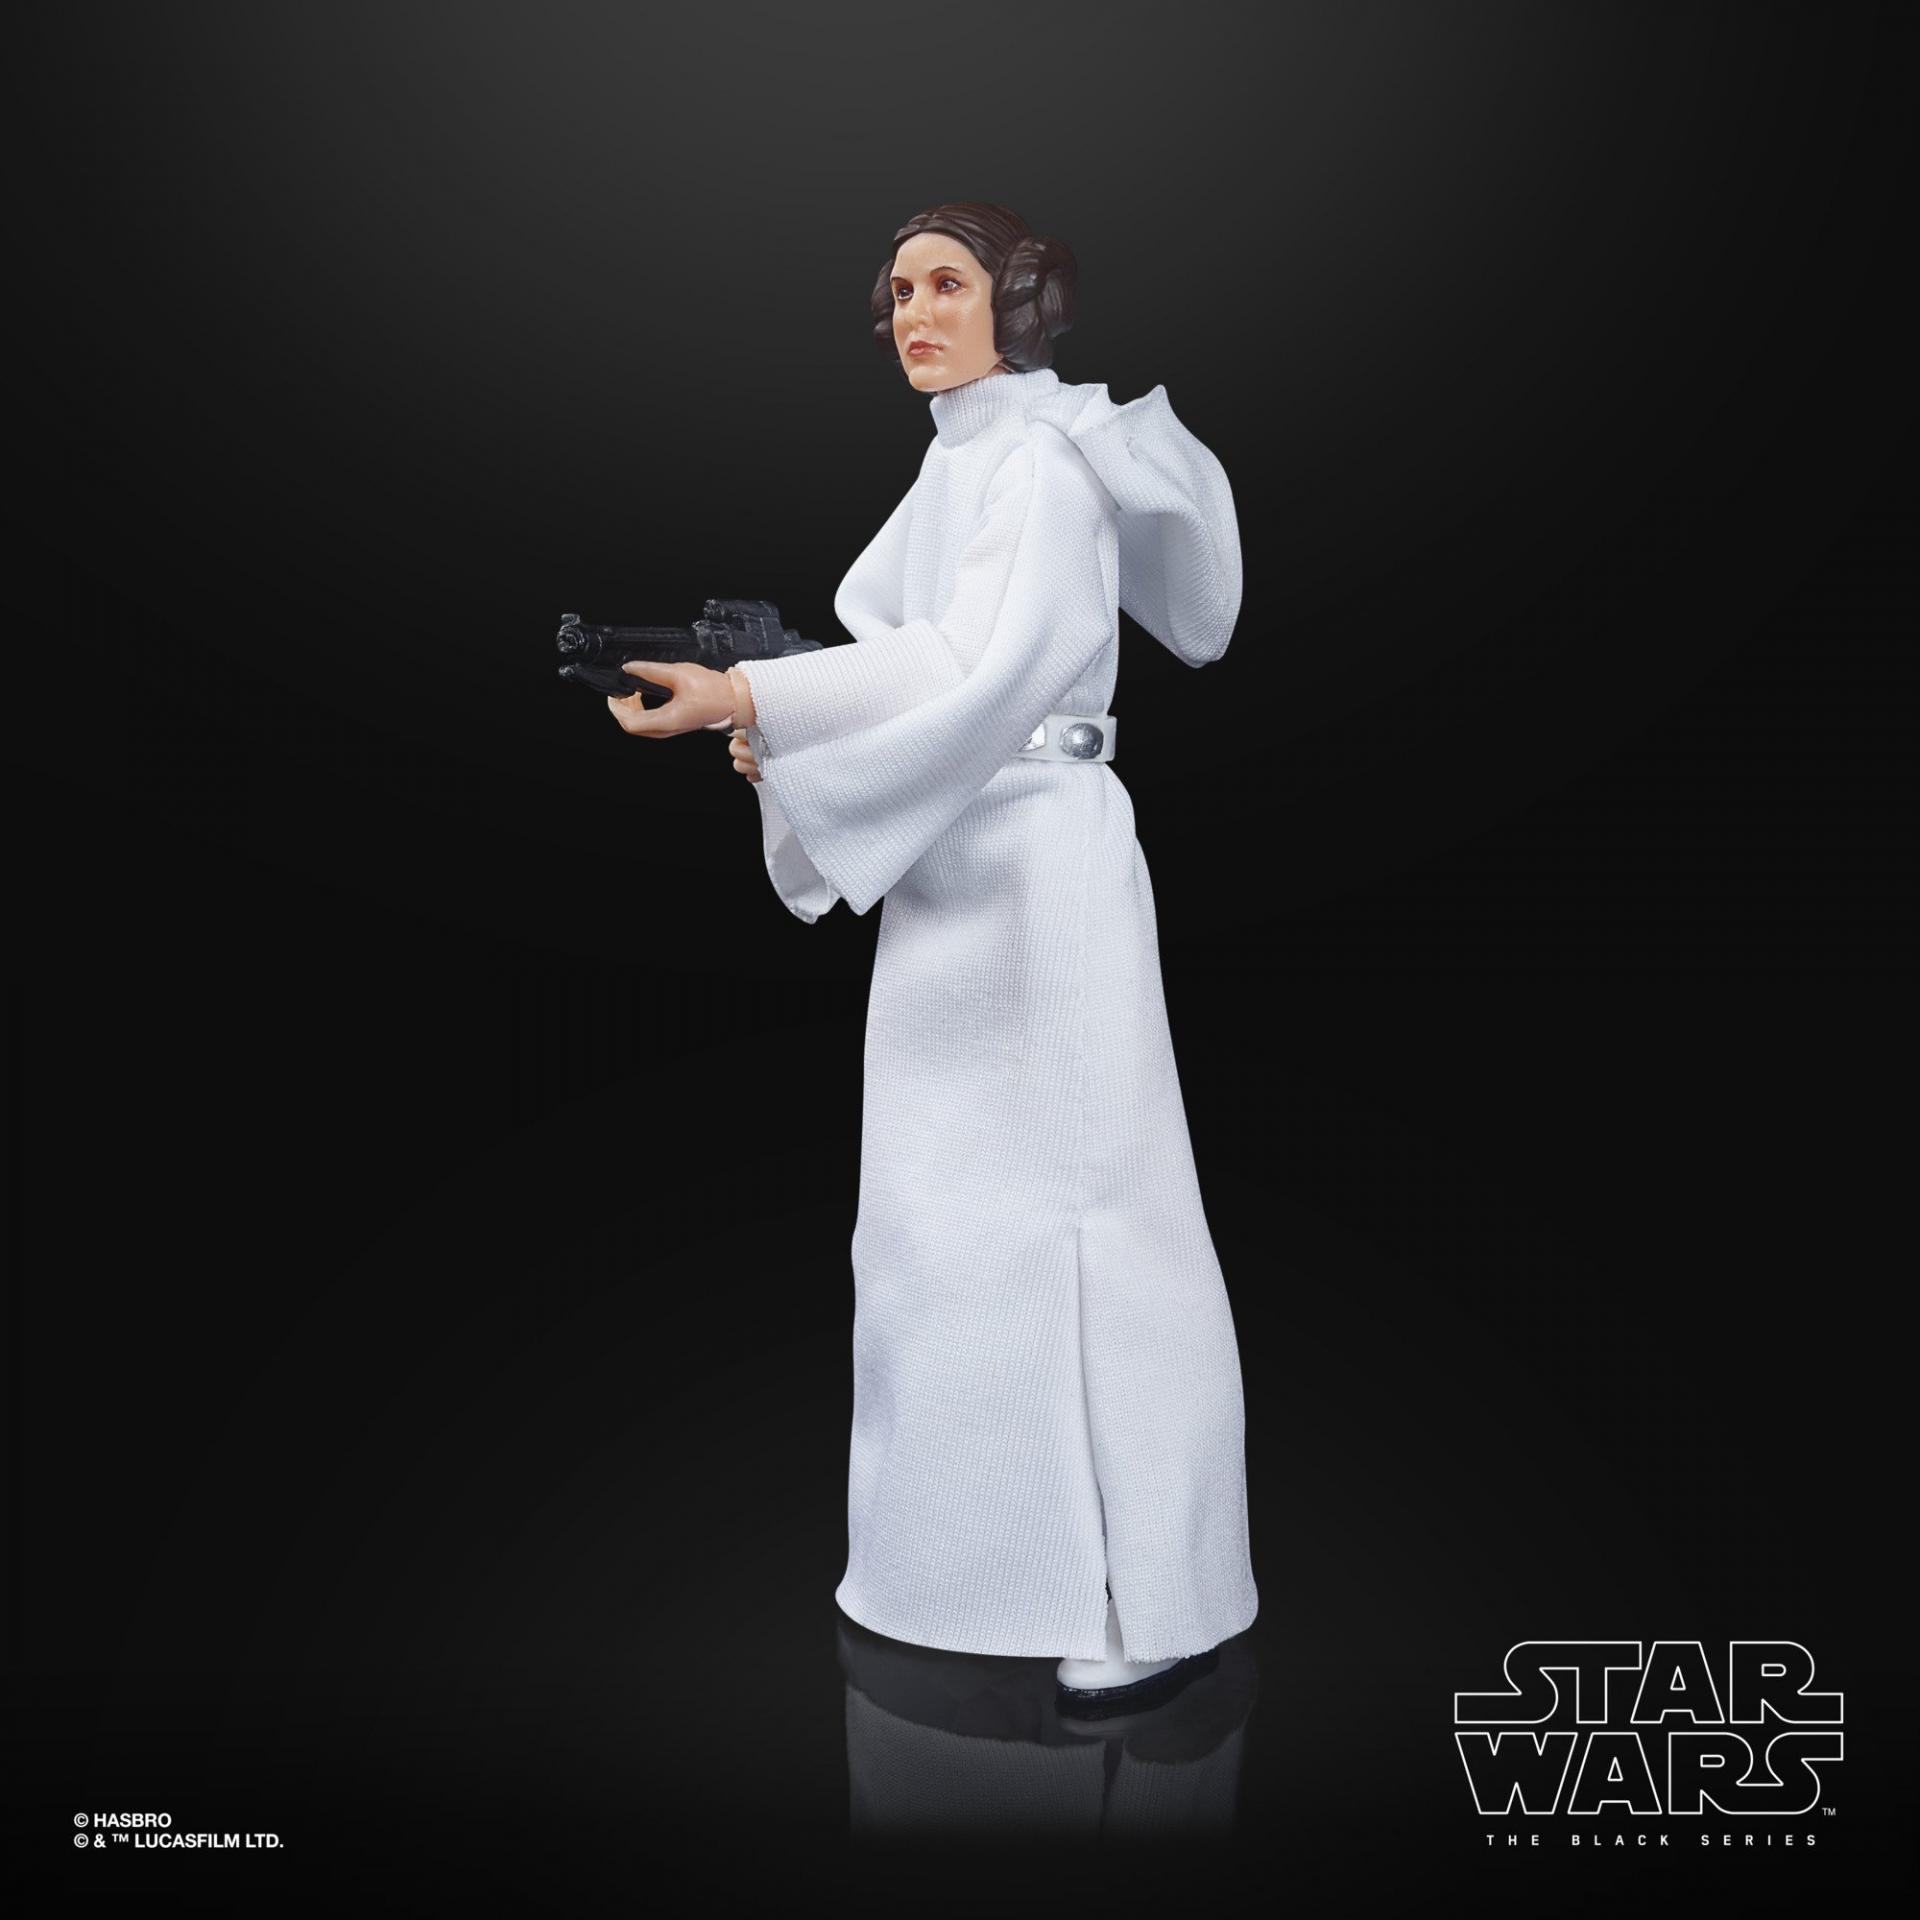 Star wars the black series archive princess leia organa 15cm2